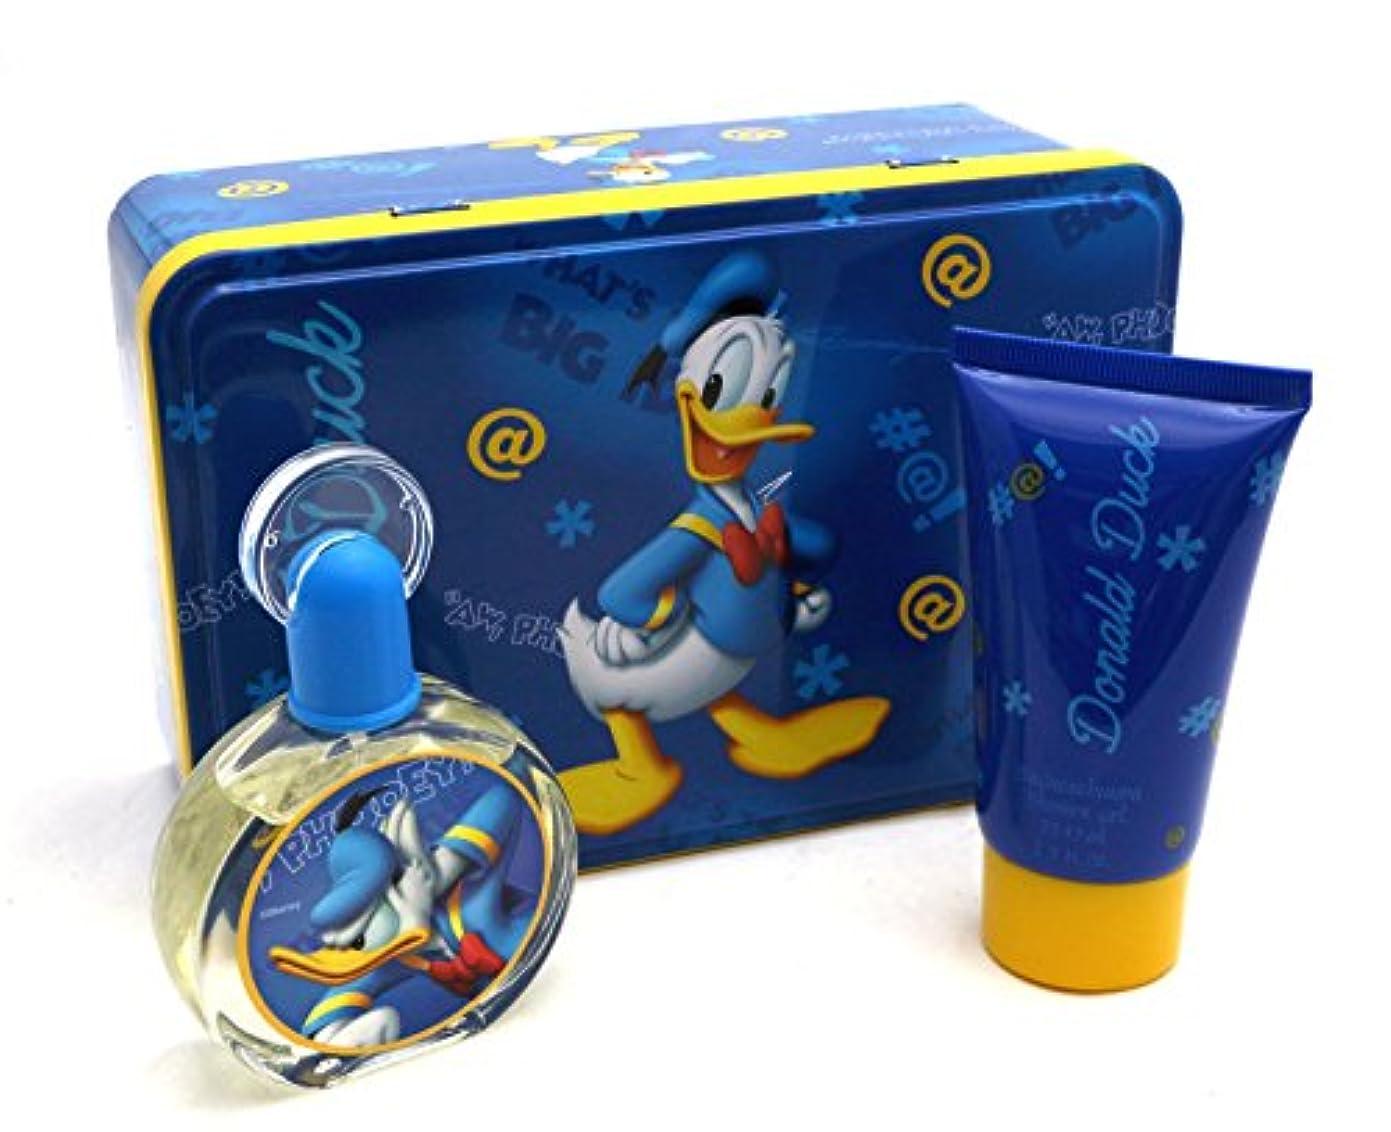 Donald Duck (ドナルドダック) 1.7 oz (50ml) EDT Spray + 2.5 oz (75ml) Shower Gel by Disney